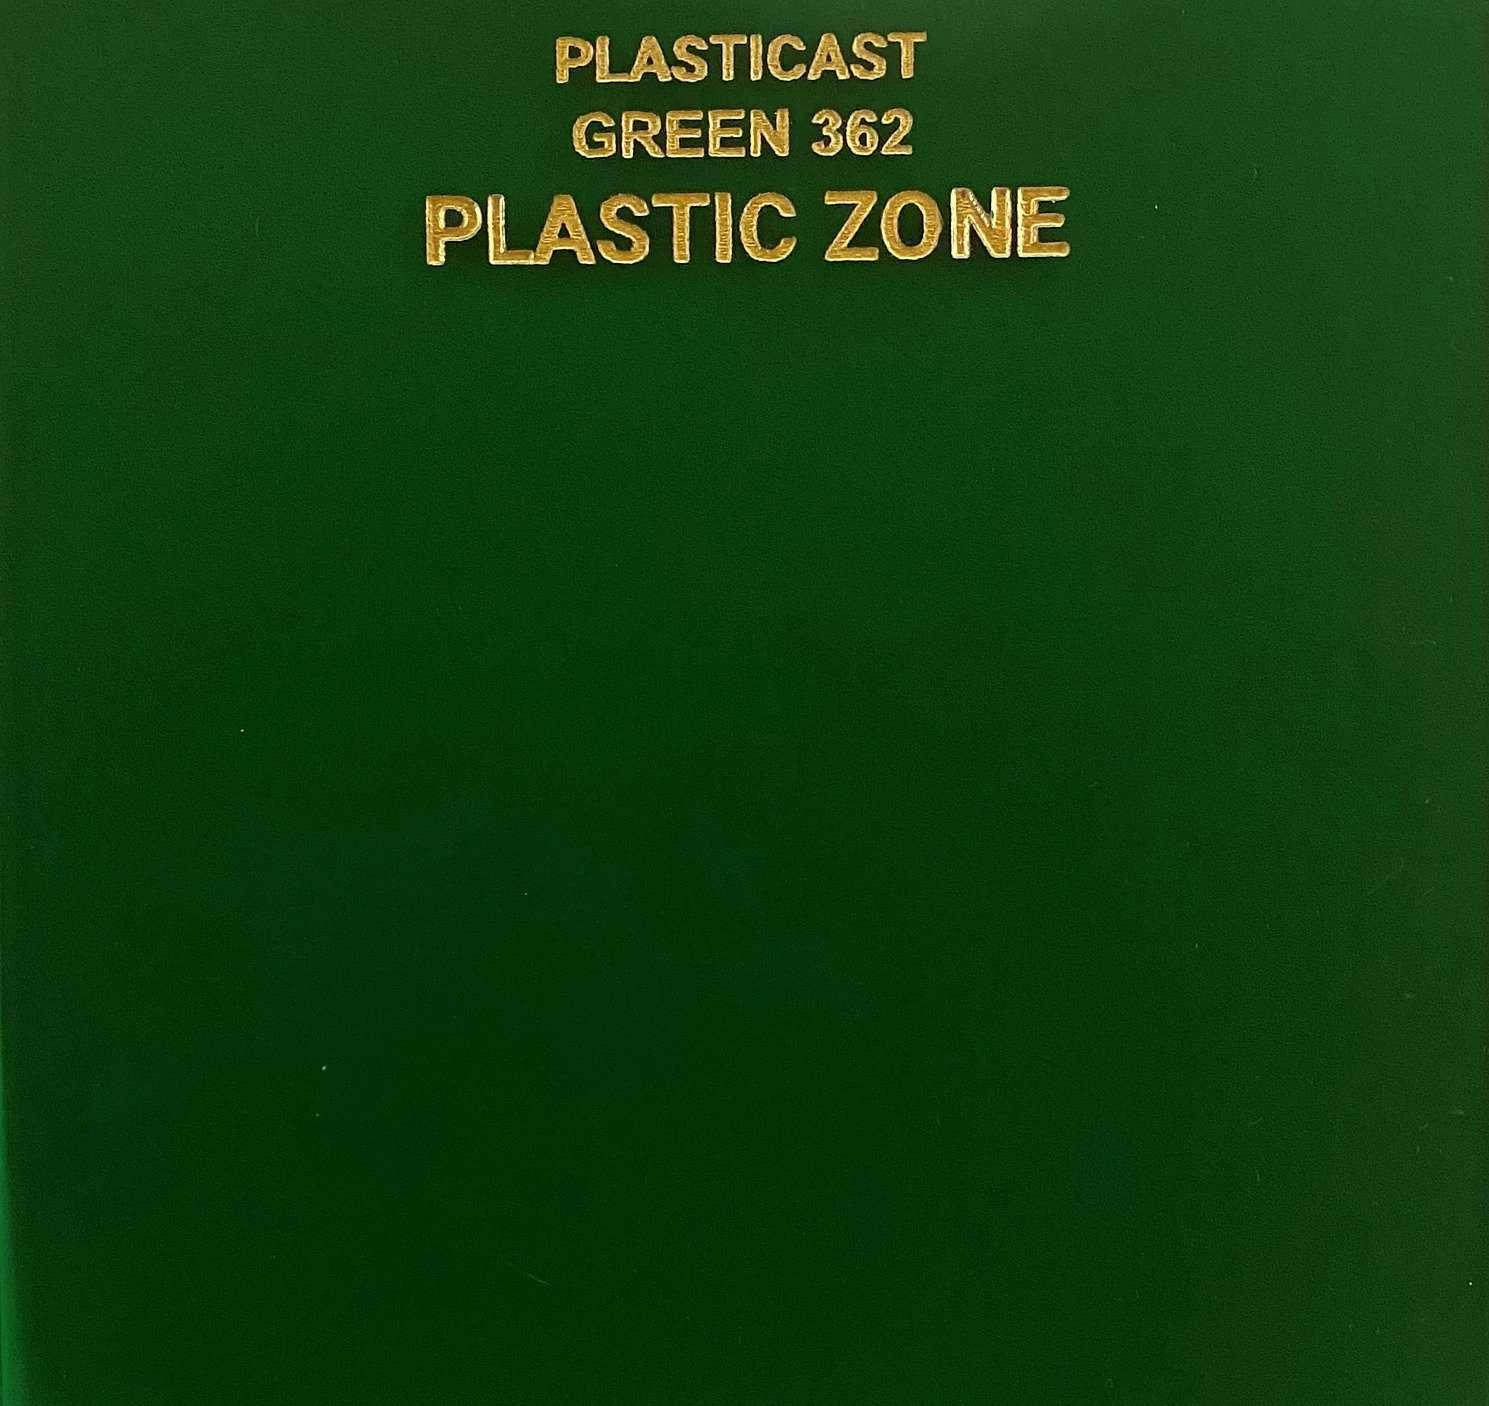 Green 362 acrylic sheet